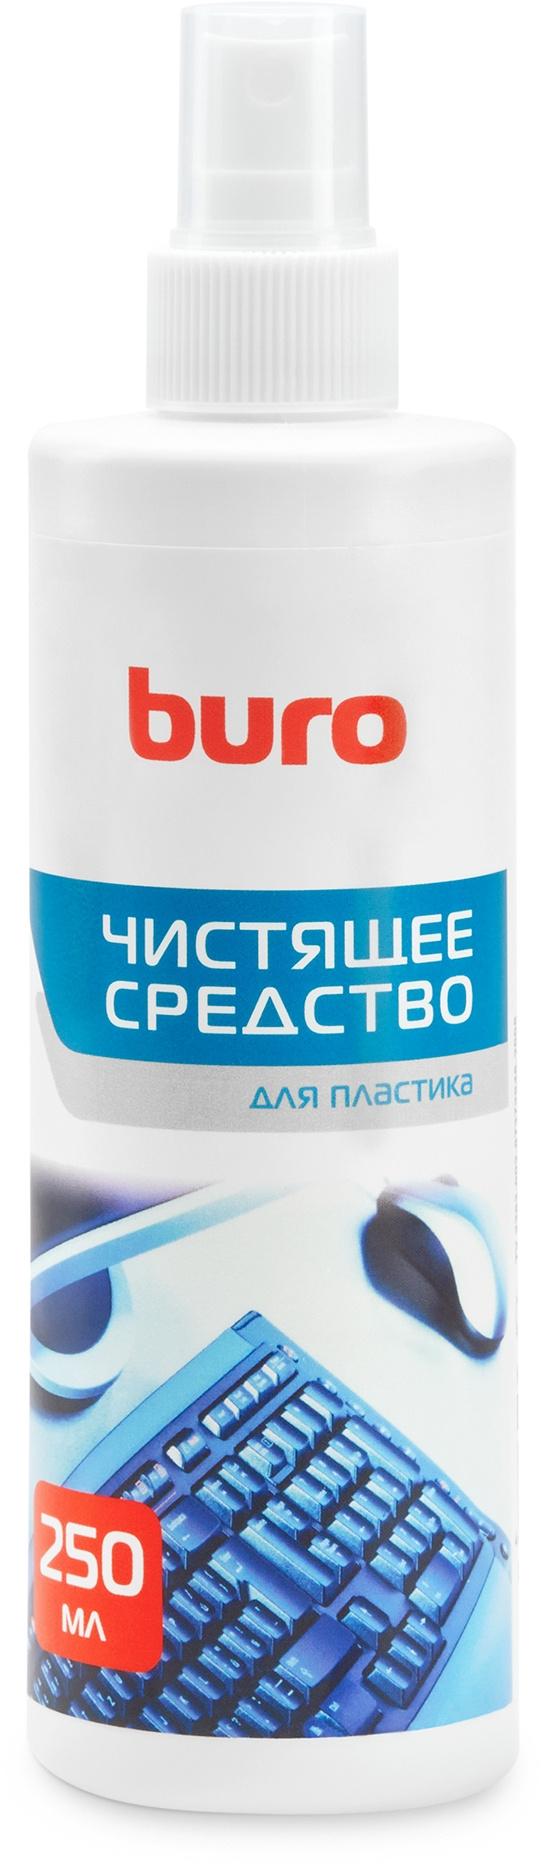 Спрей Buro BU-Ssurface для пластика 250мл